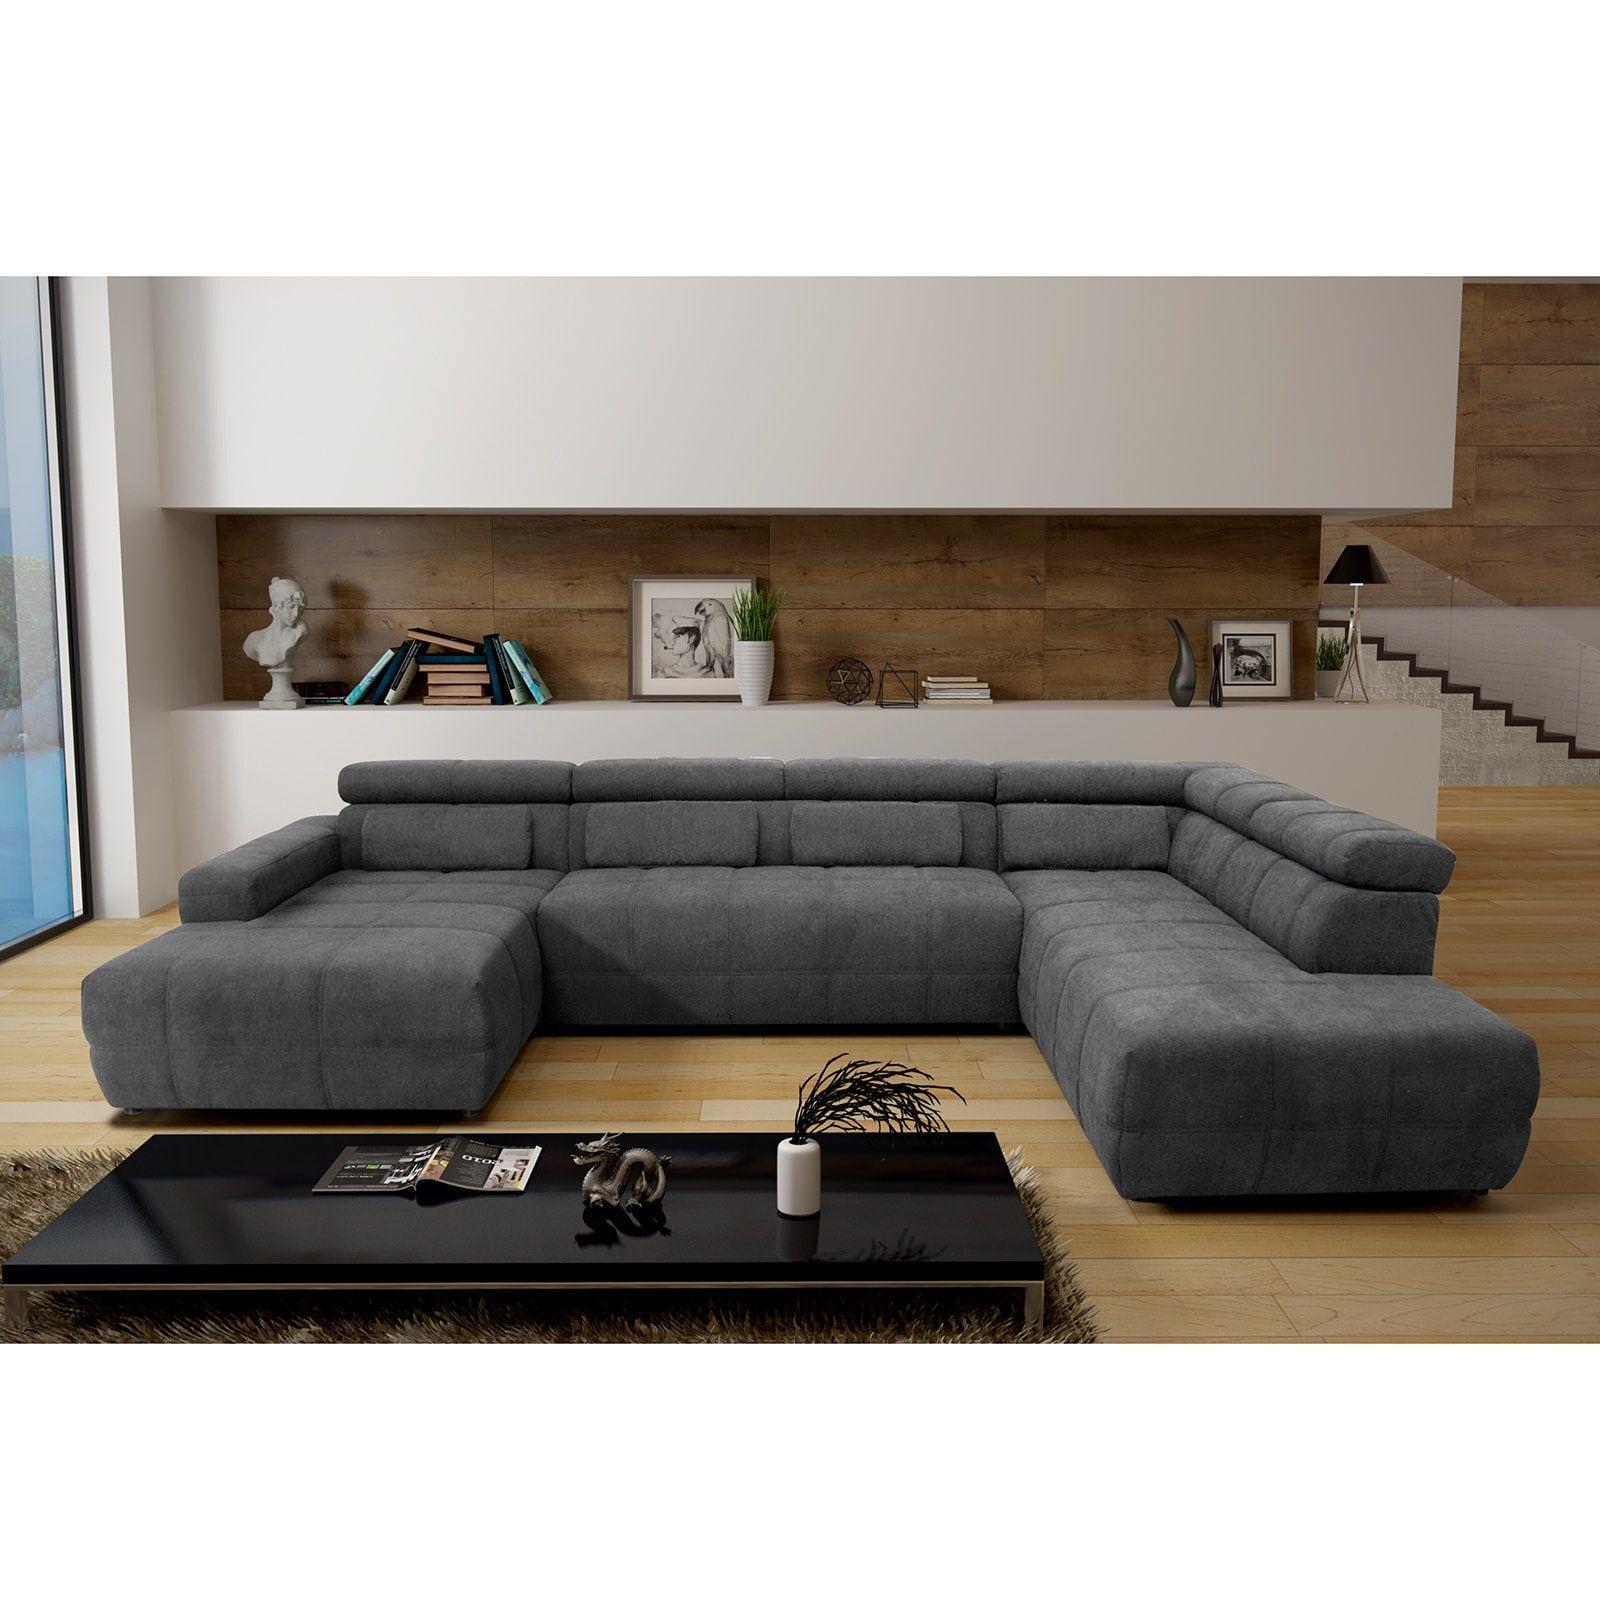 3 Sitzer Sofa rot Kunstleder verchromte Metallfüße Rücken im